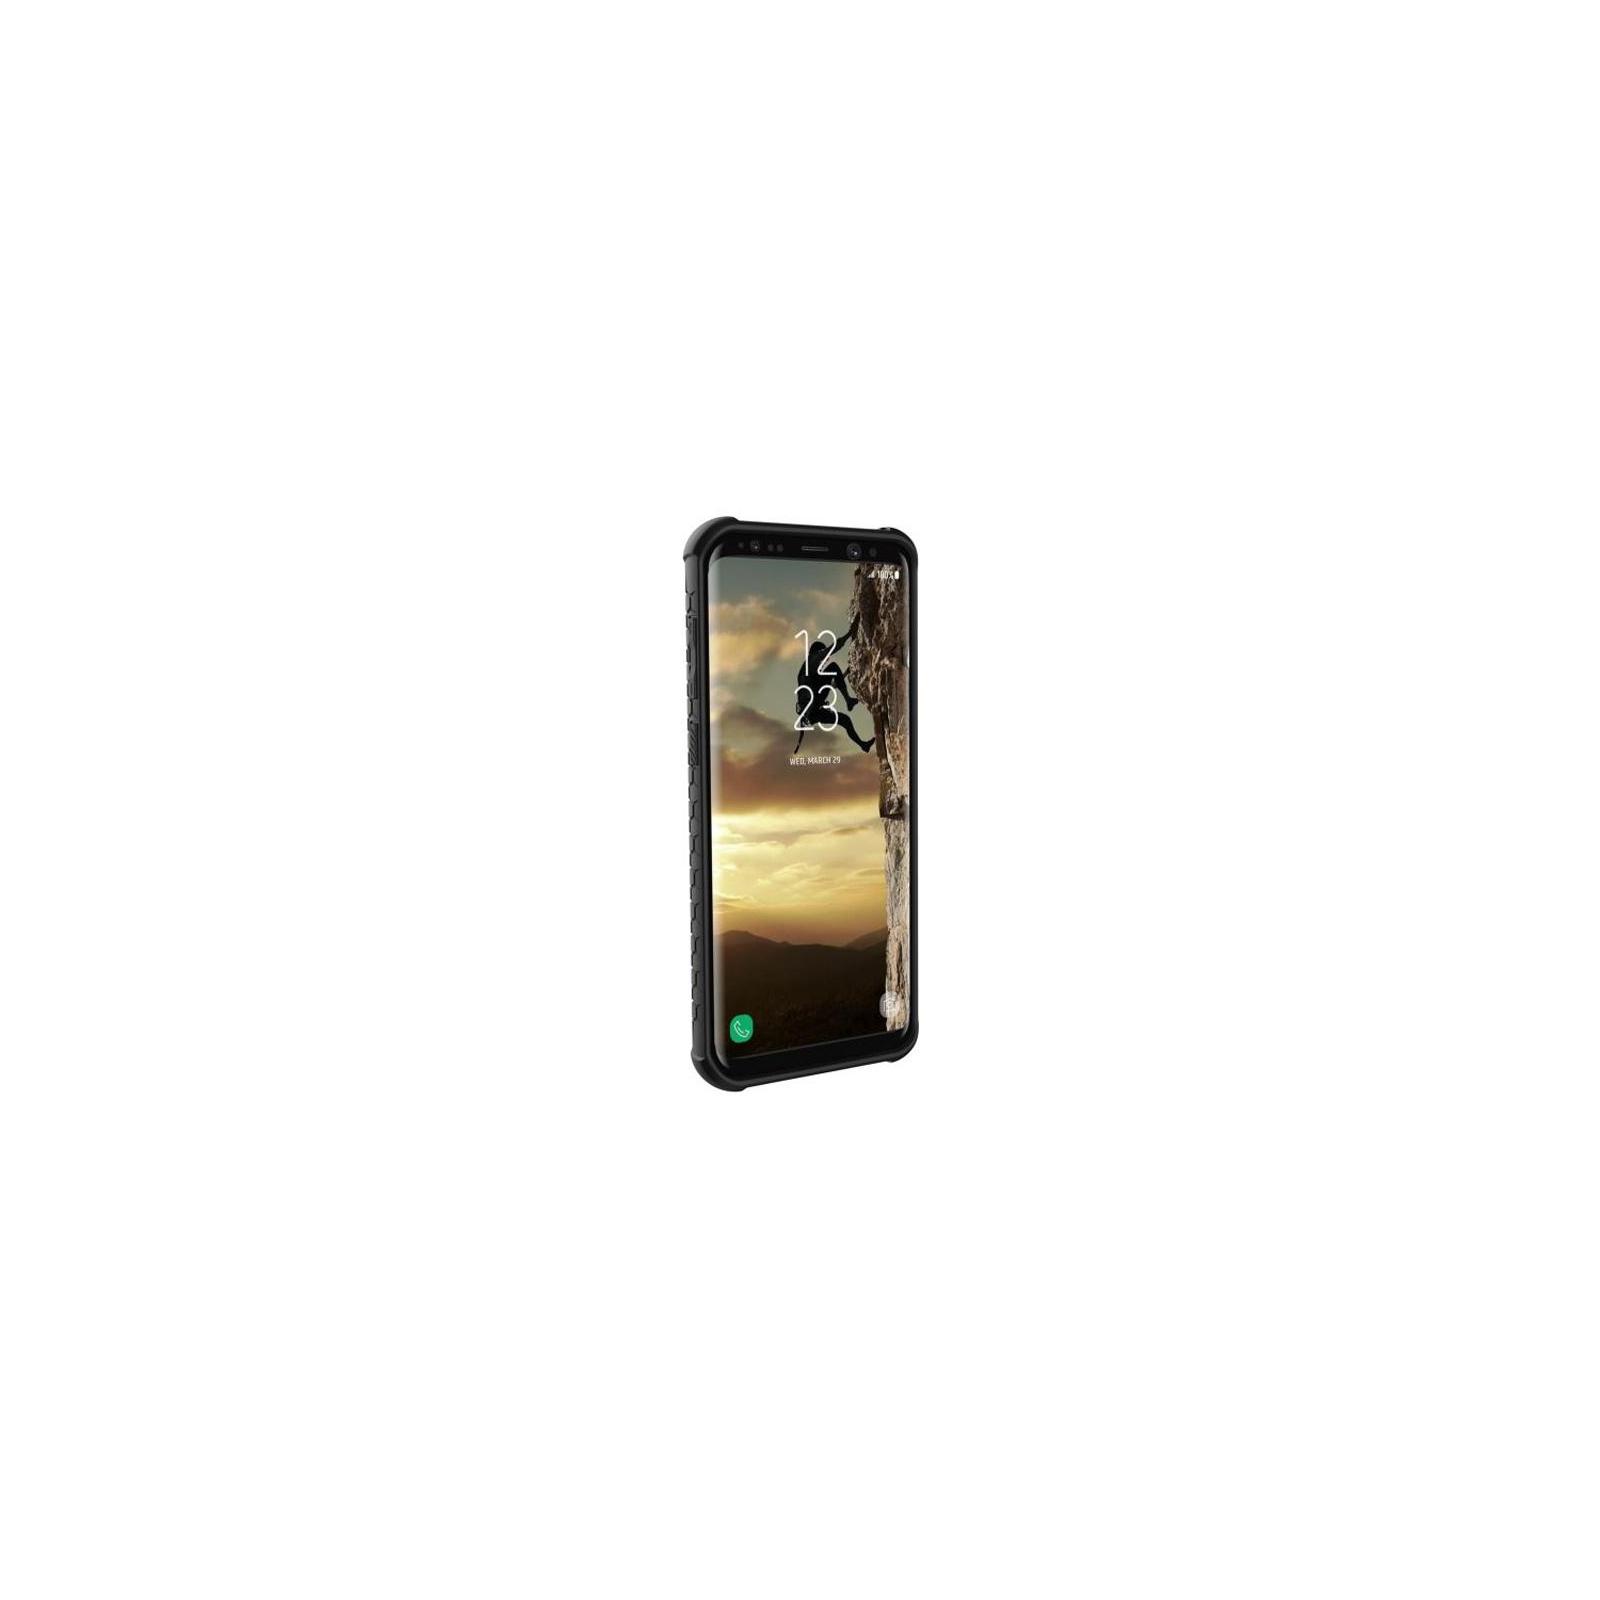 Чехол для моб. телефона Uag Galaxy S8 + Monarch Graphite (GLXS8PLS-M-GR) изображение 5